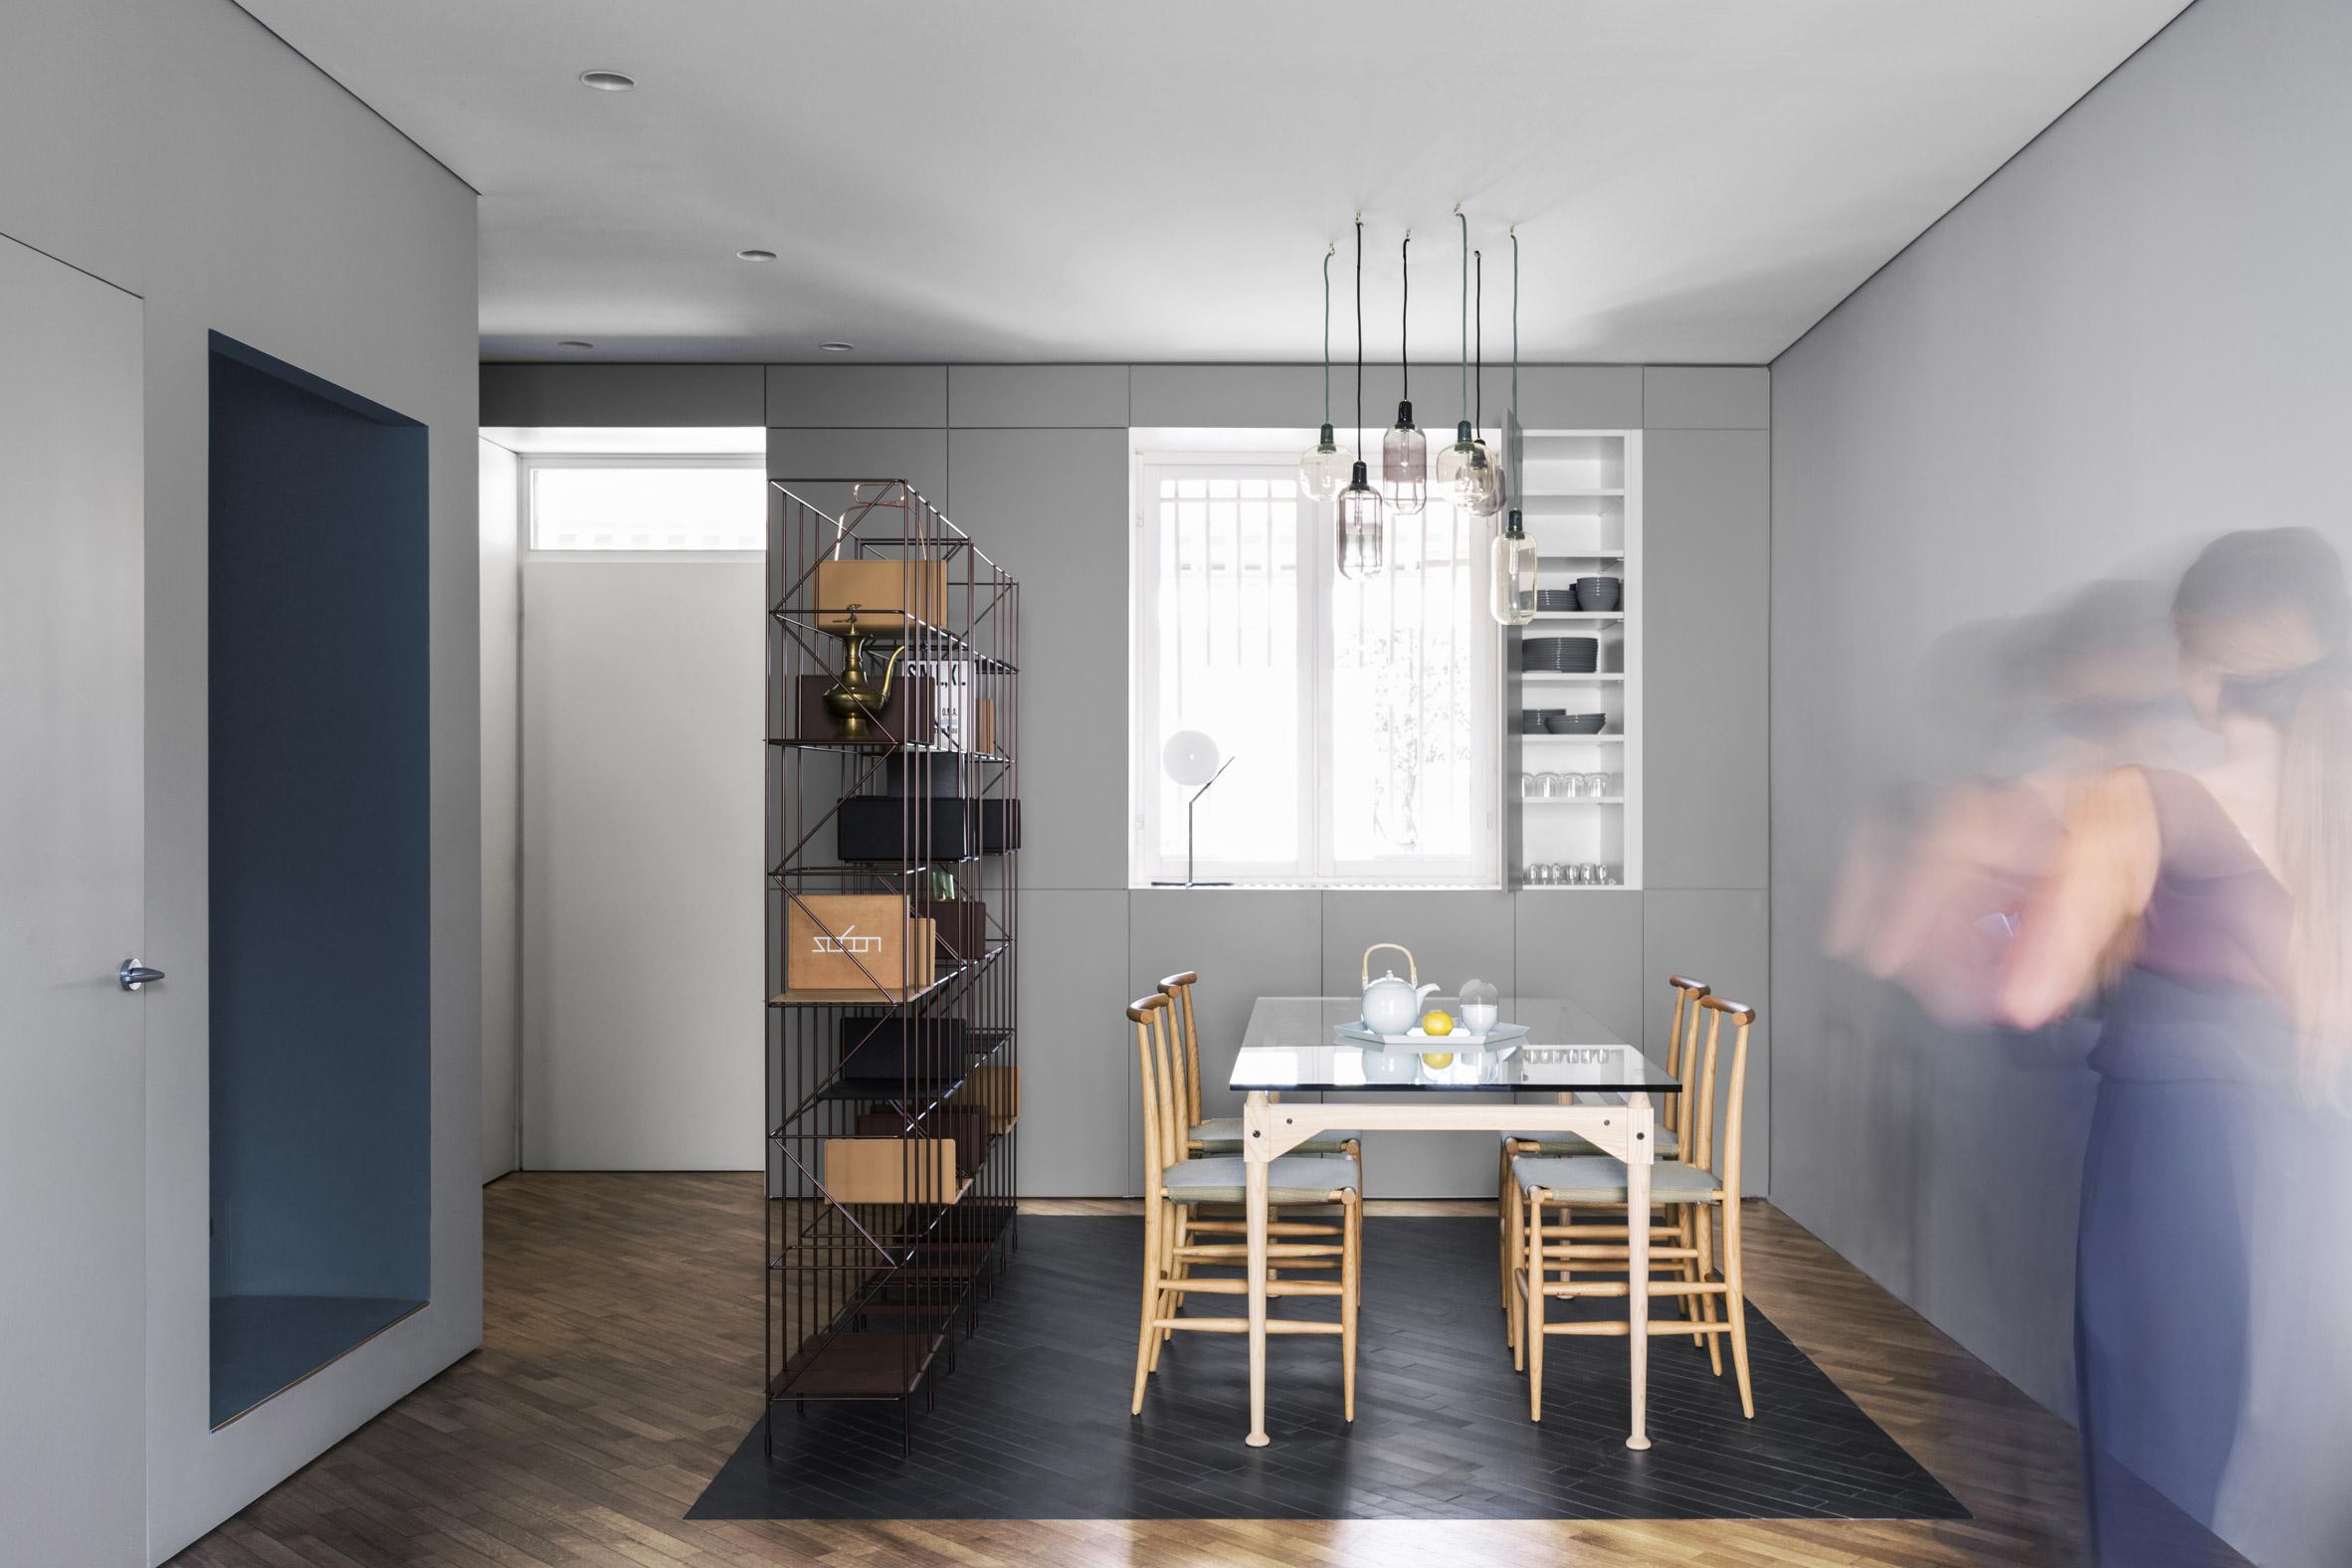 architecture-house-residential-design-studia-interiors-osnovadesign-osnova-poltava_05